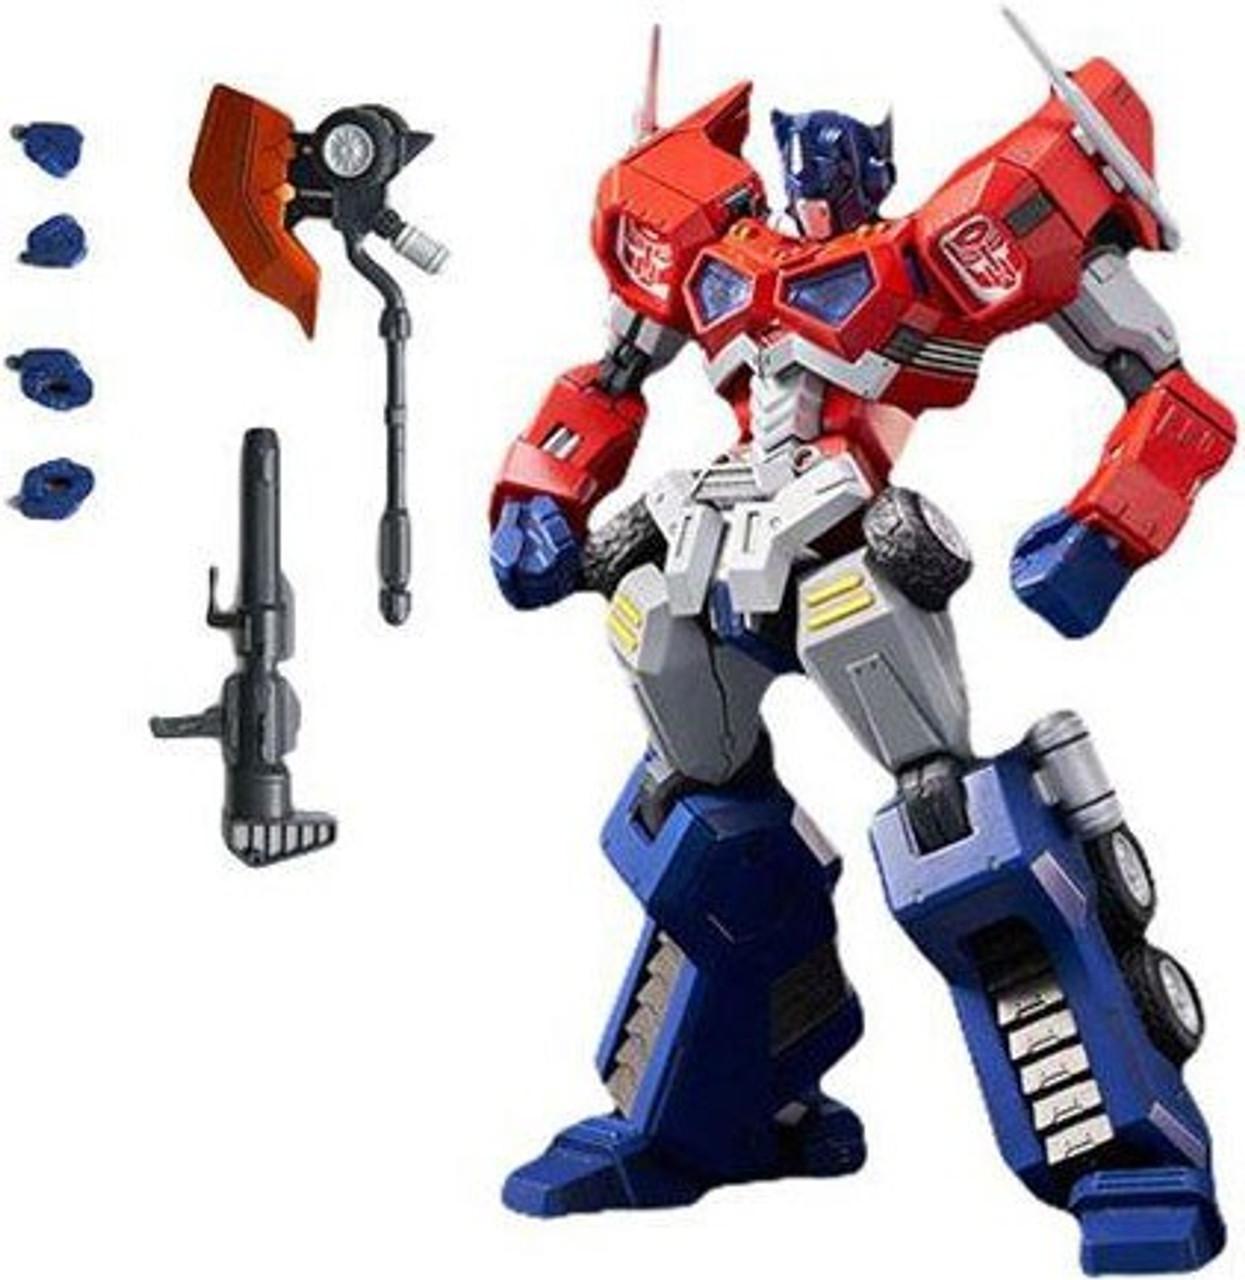 Transformers Furai Optimus Prime 61 Inch 61 Model Kit 01 Attack Mode